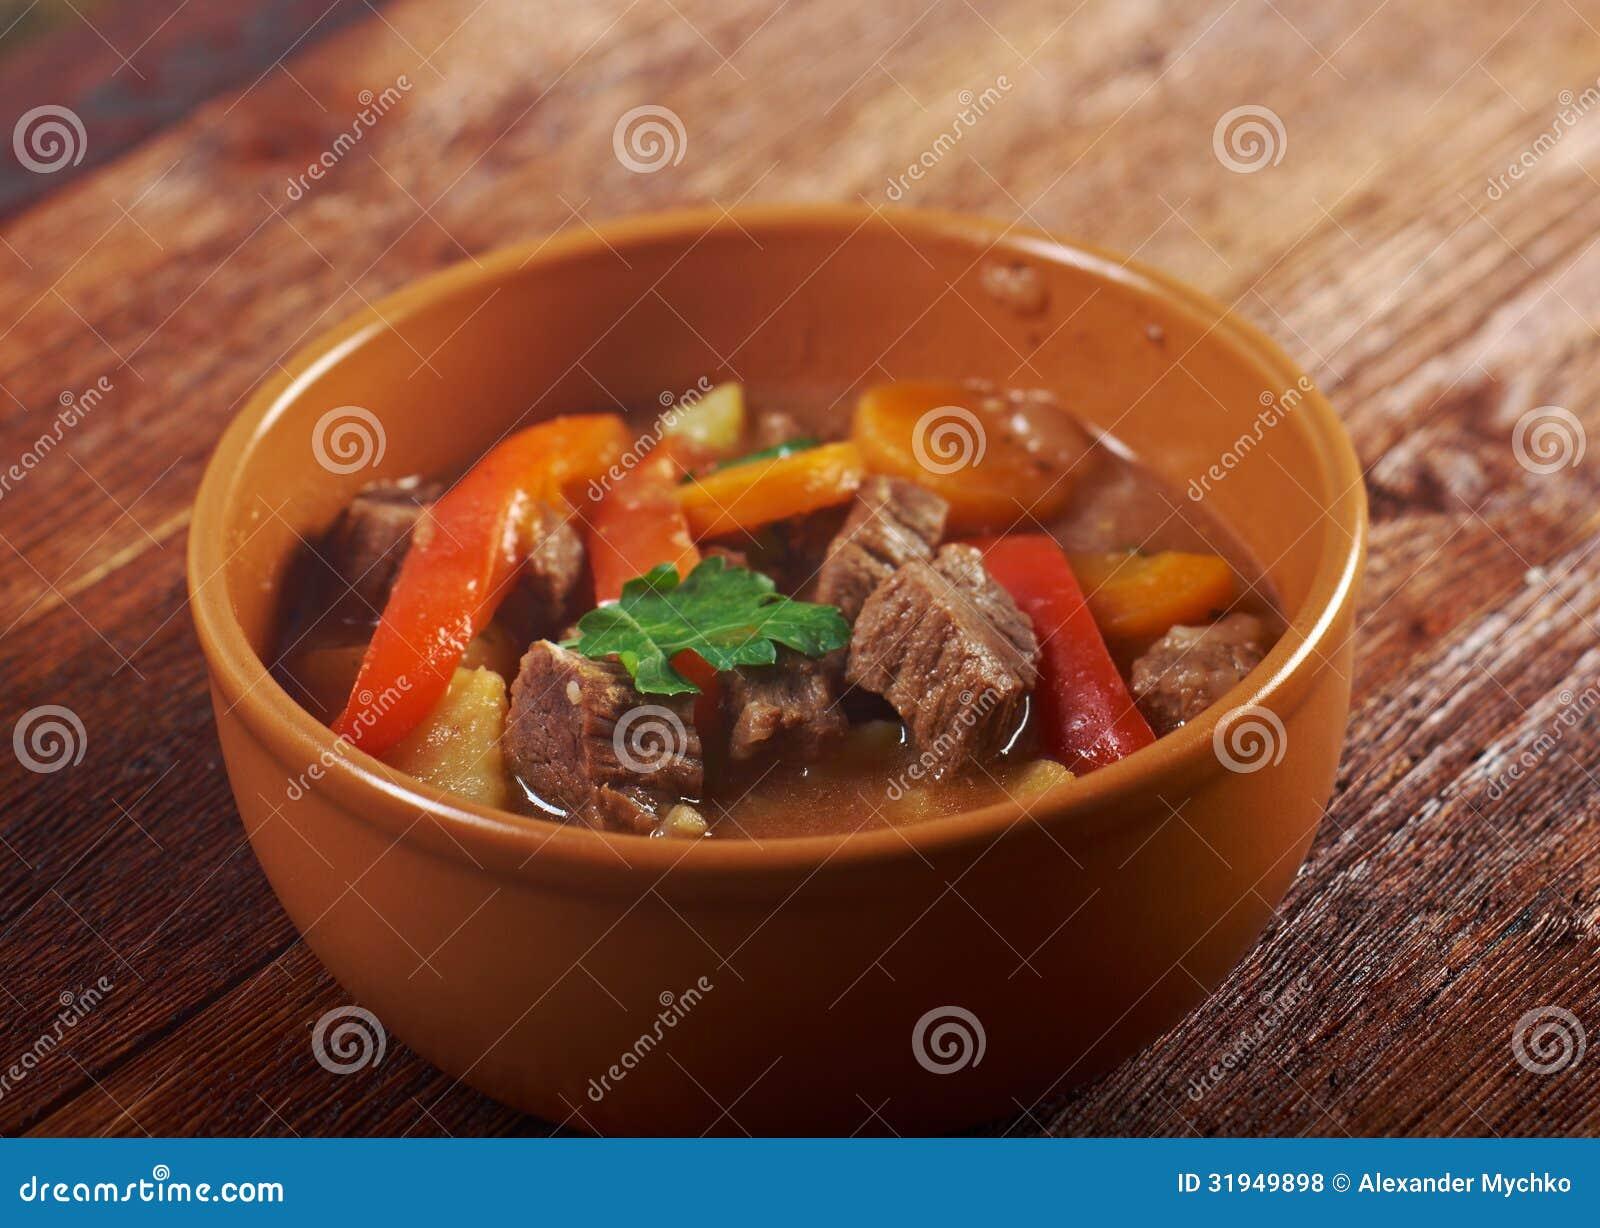 how to make lamb meat tender